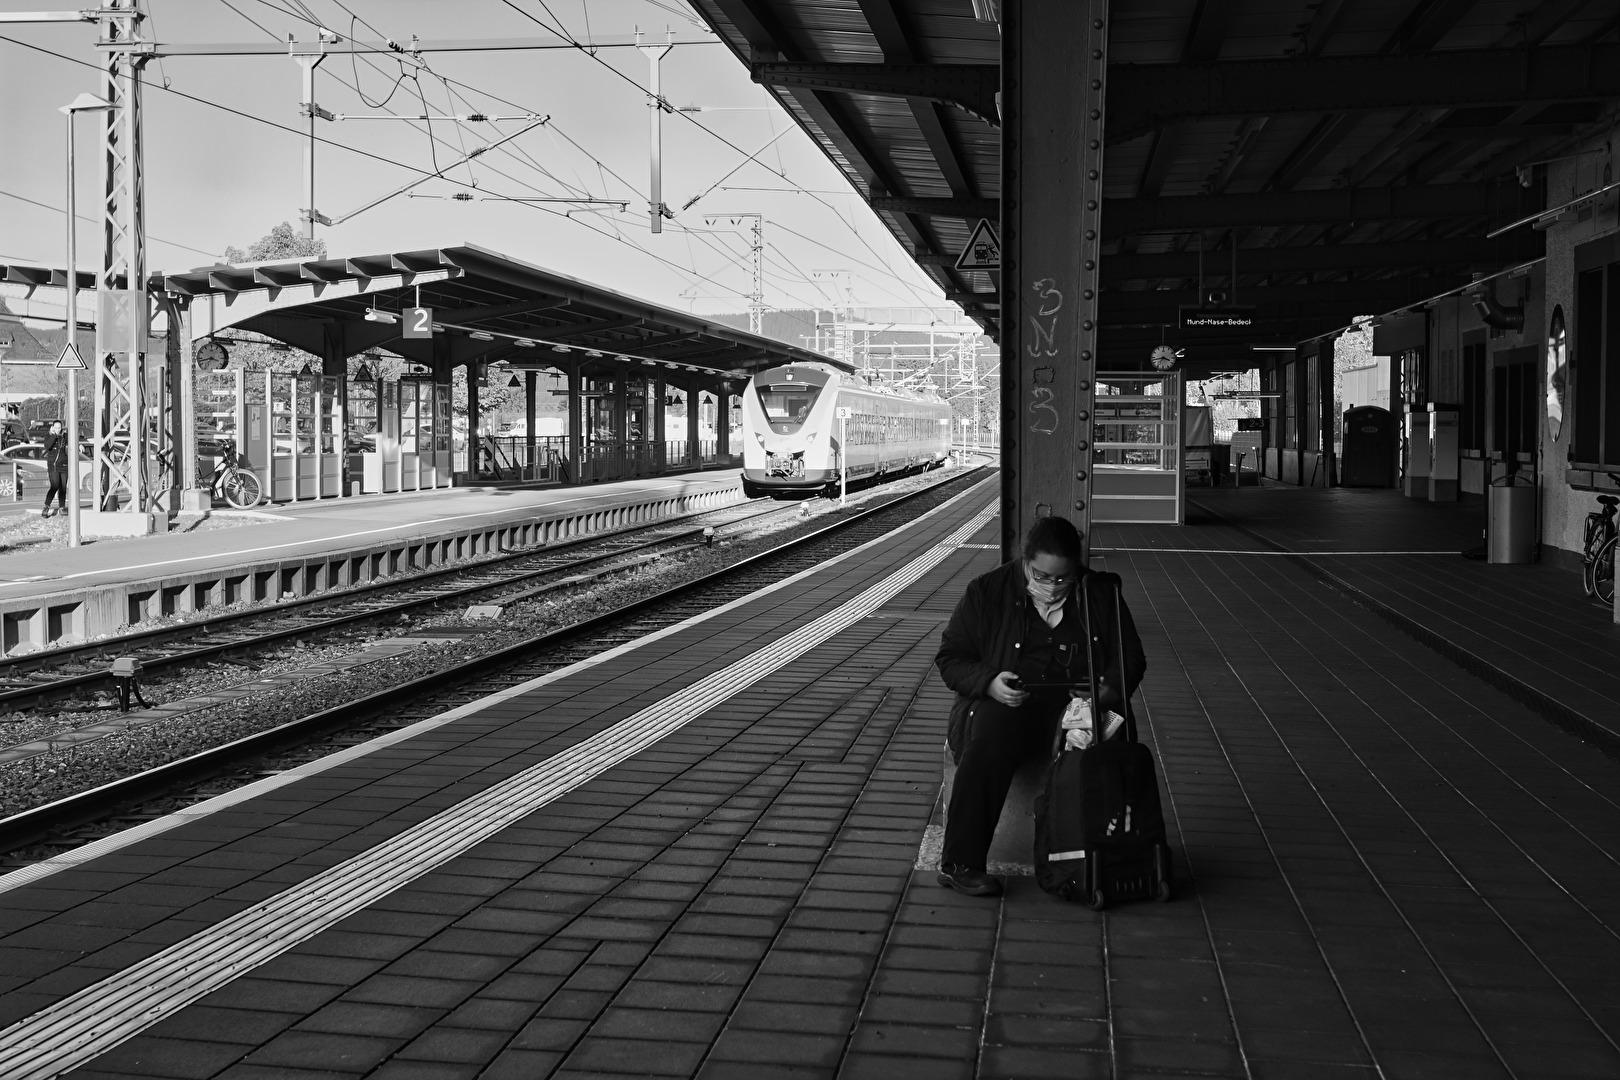 Bahnhöfe in Corona Zeiten